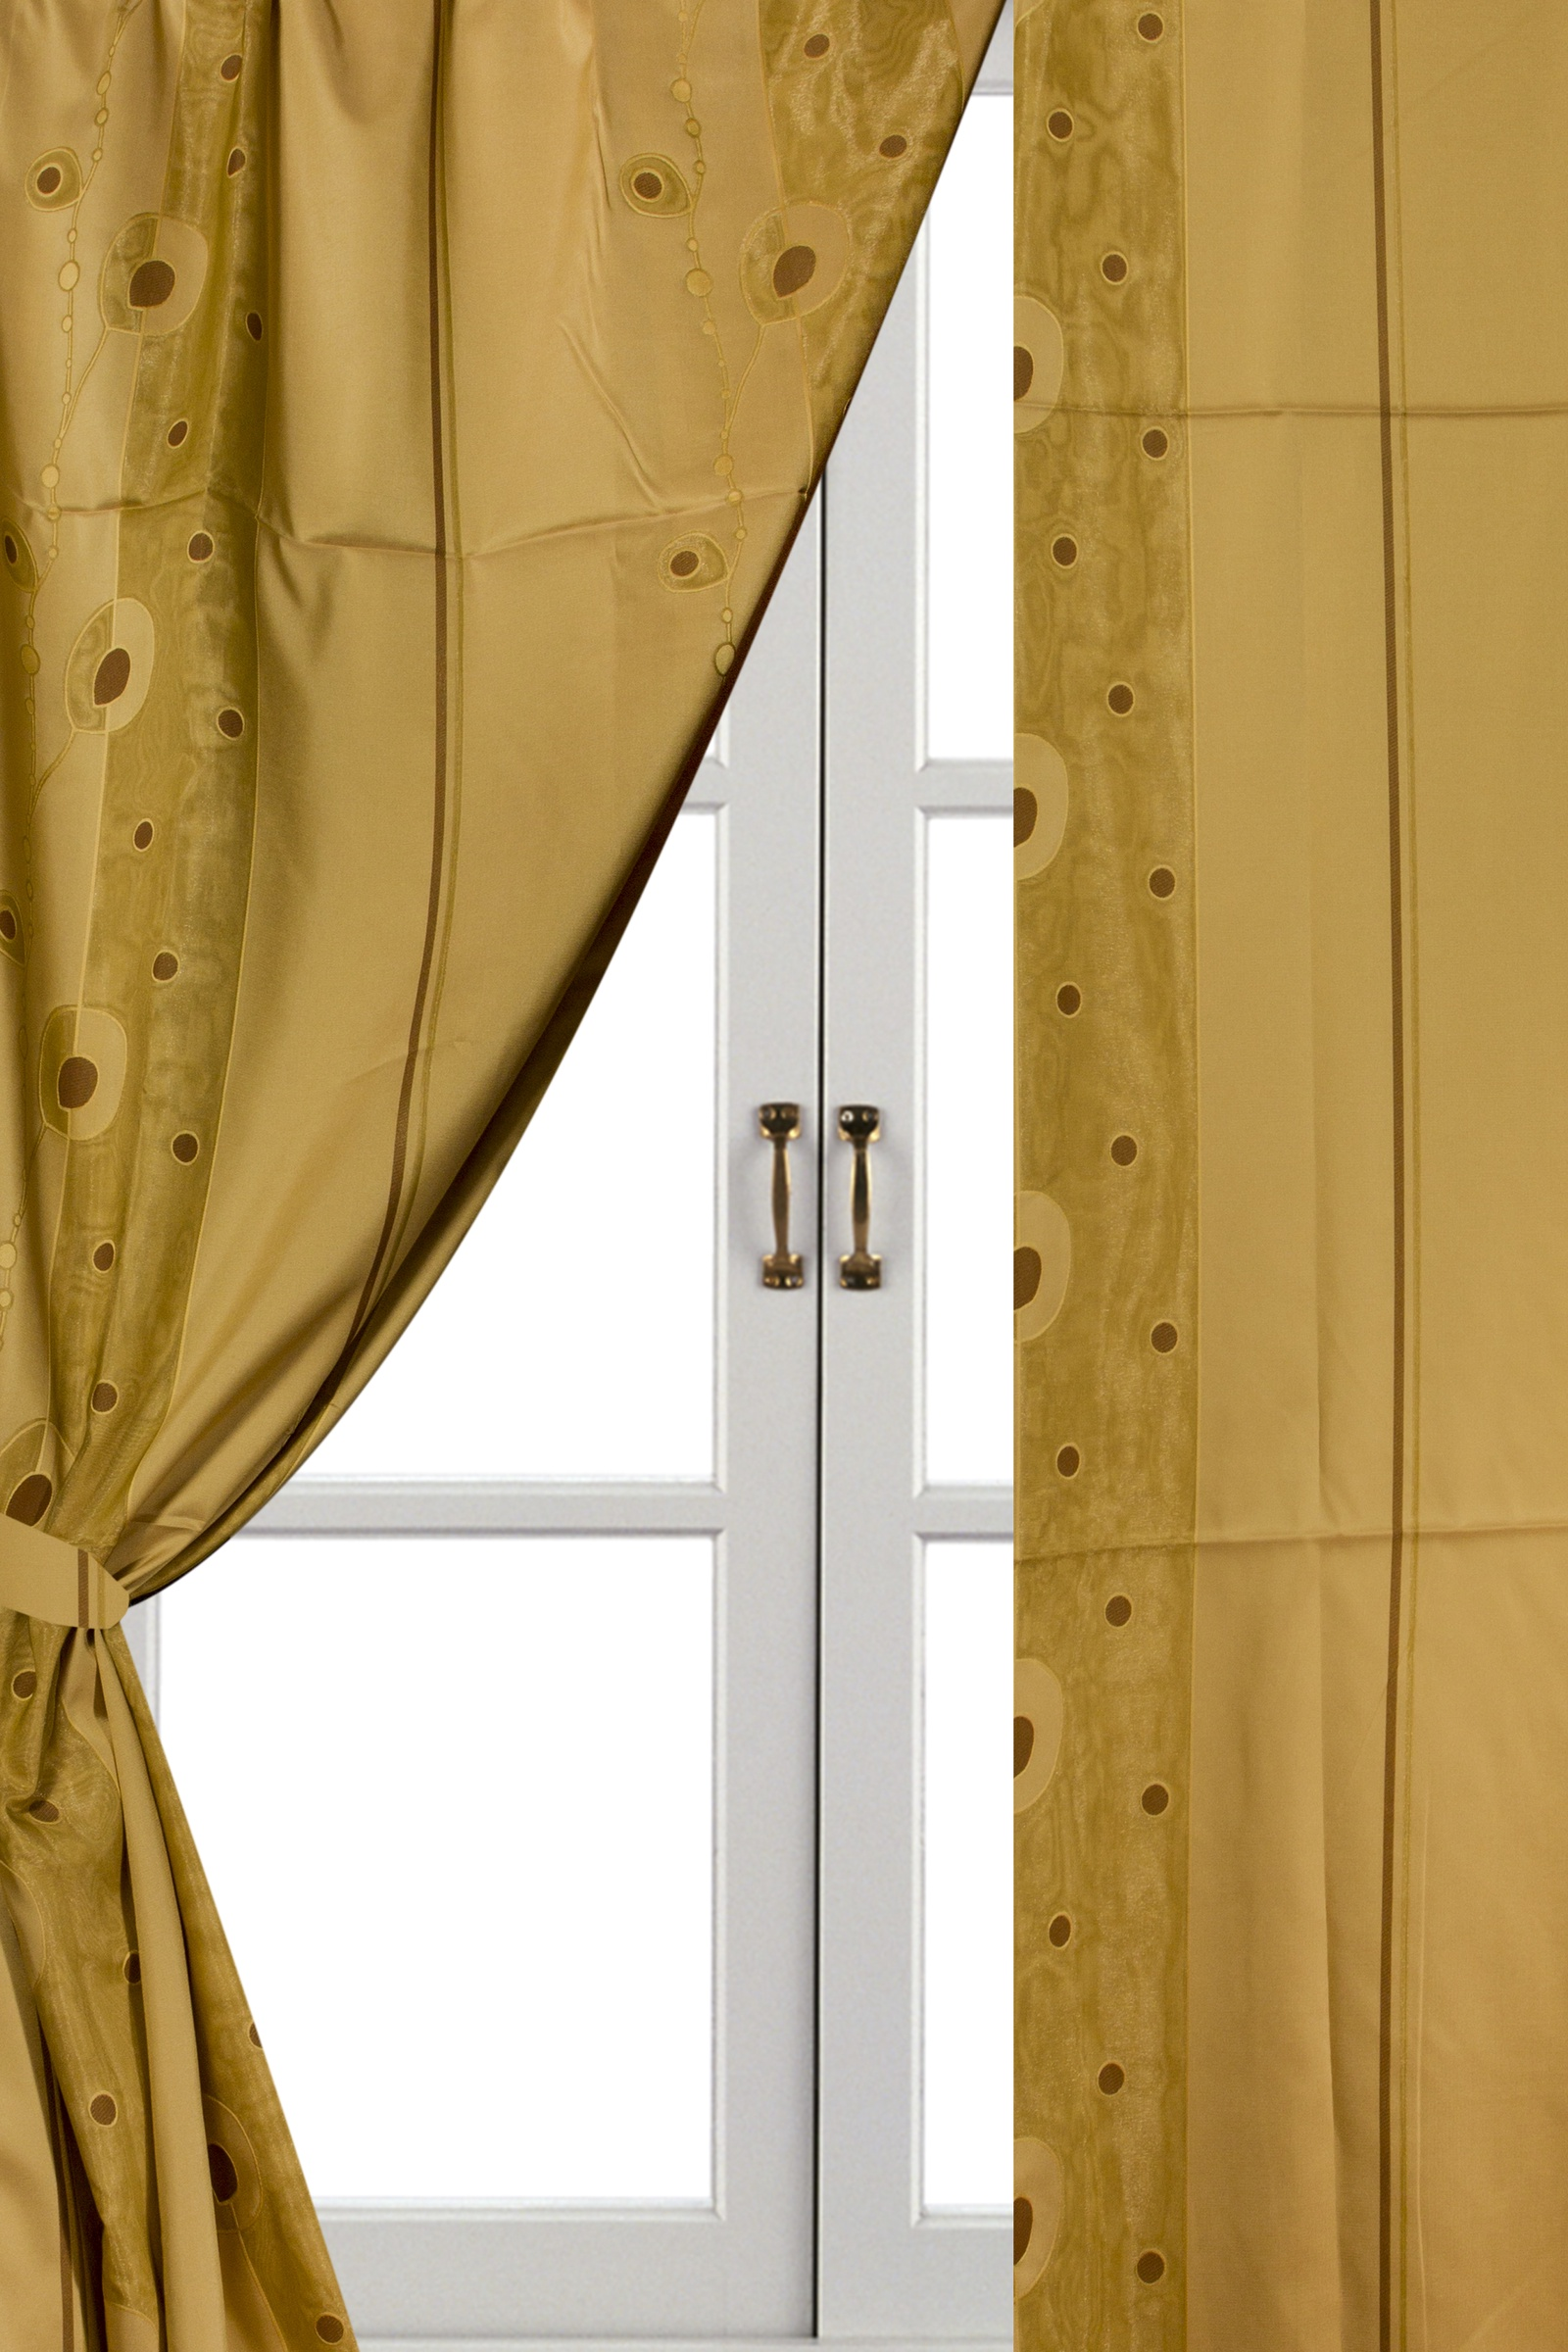 Шторы комнатные Айлант ОБ41 шторы homedeco нитяные шторы яркие кольца